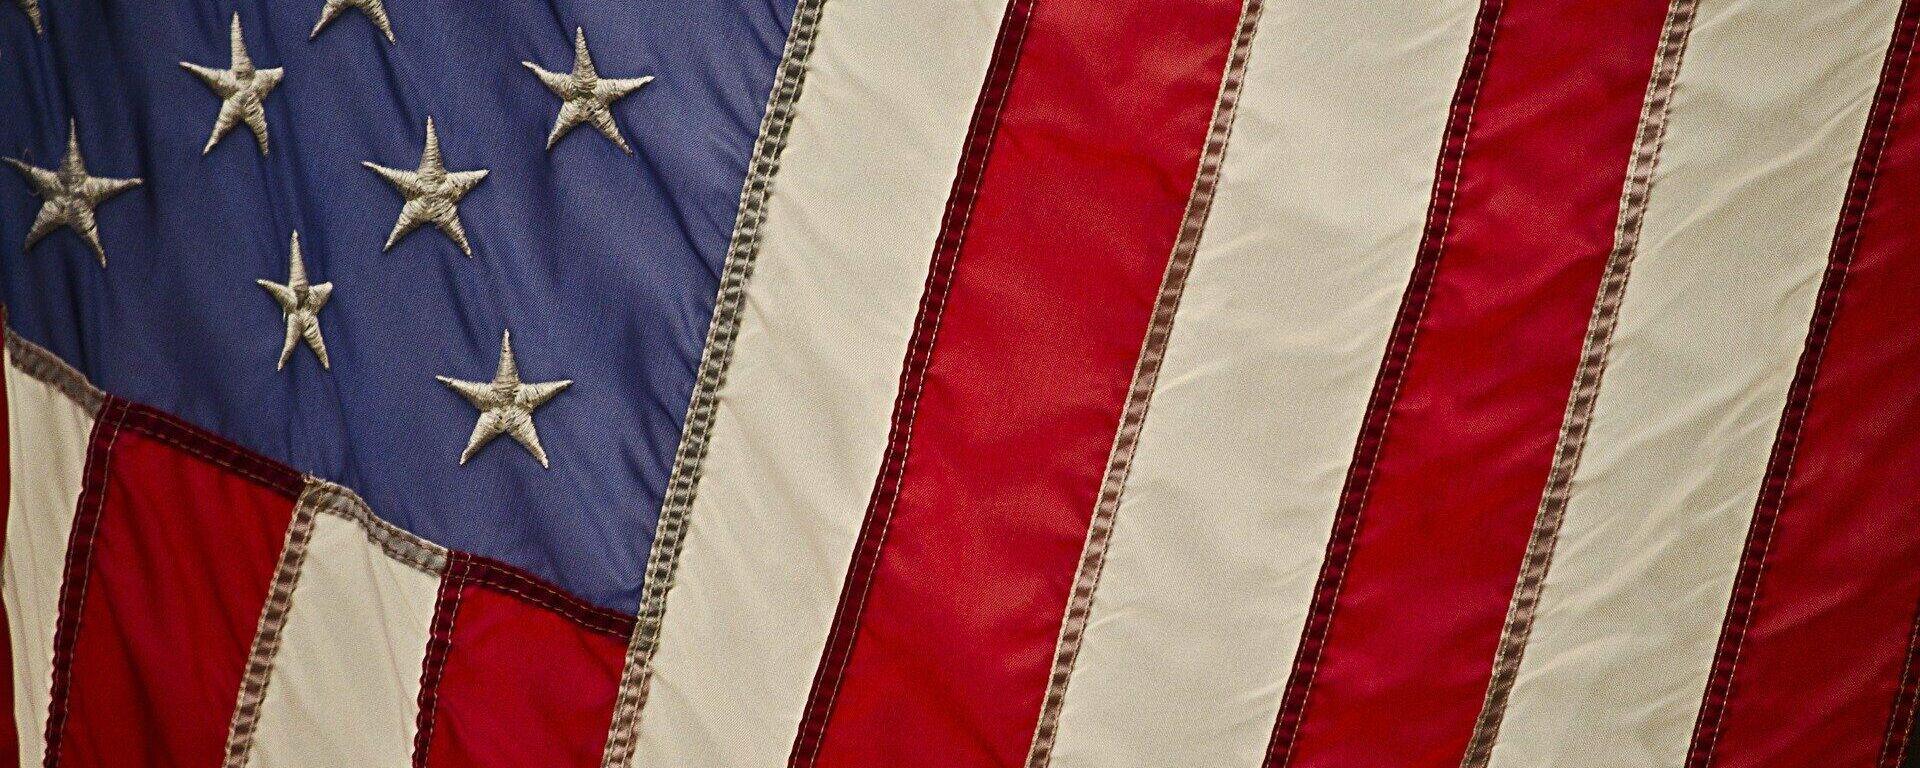 Bandera de EEUU - Sputnik Mundo, 1920, 04.10.2021